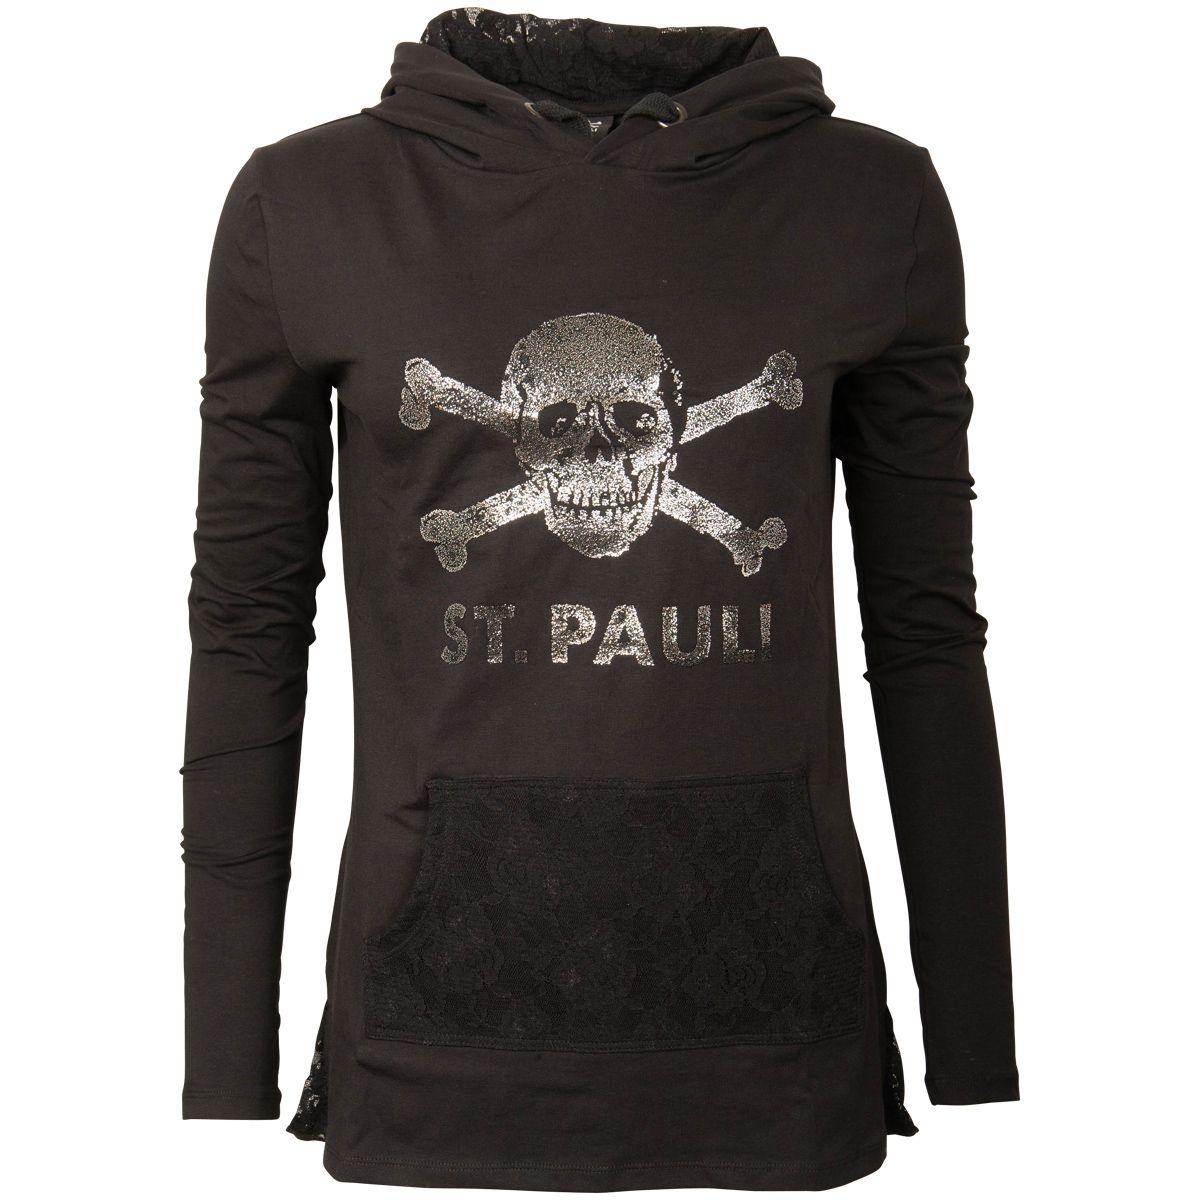 FC St. Pauli - Damen Kapuzenpullover Punk & Lace - schwarz